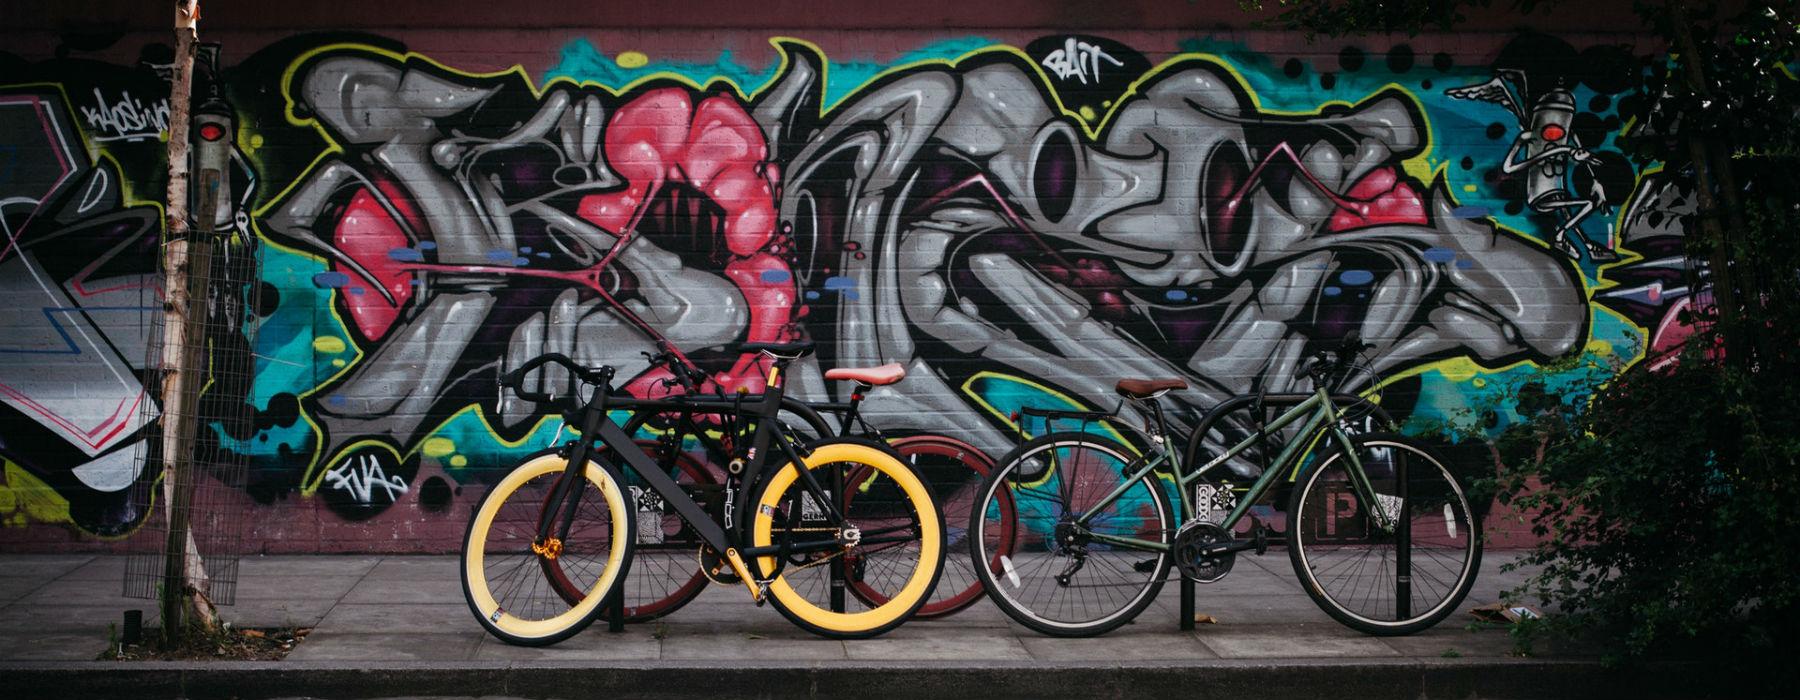 Street art e biciclette